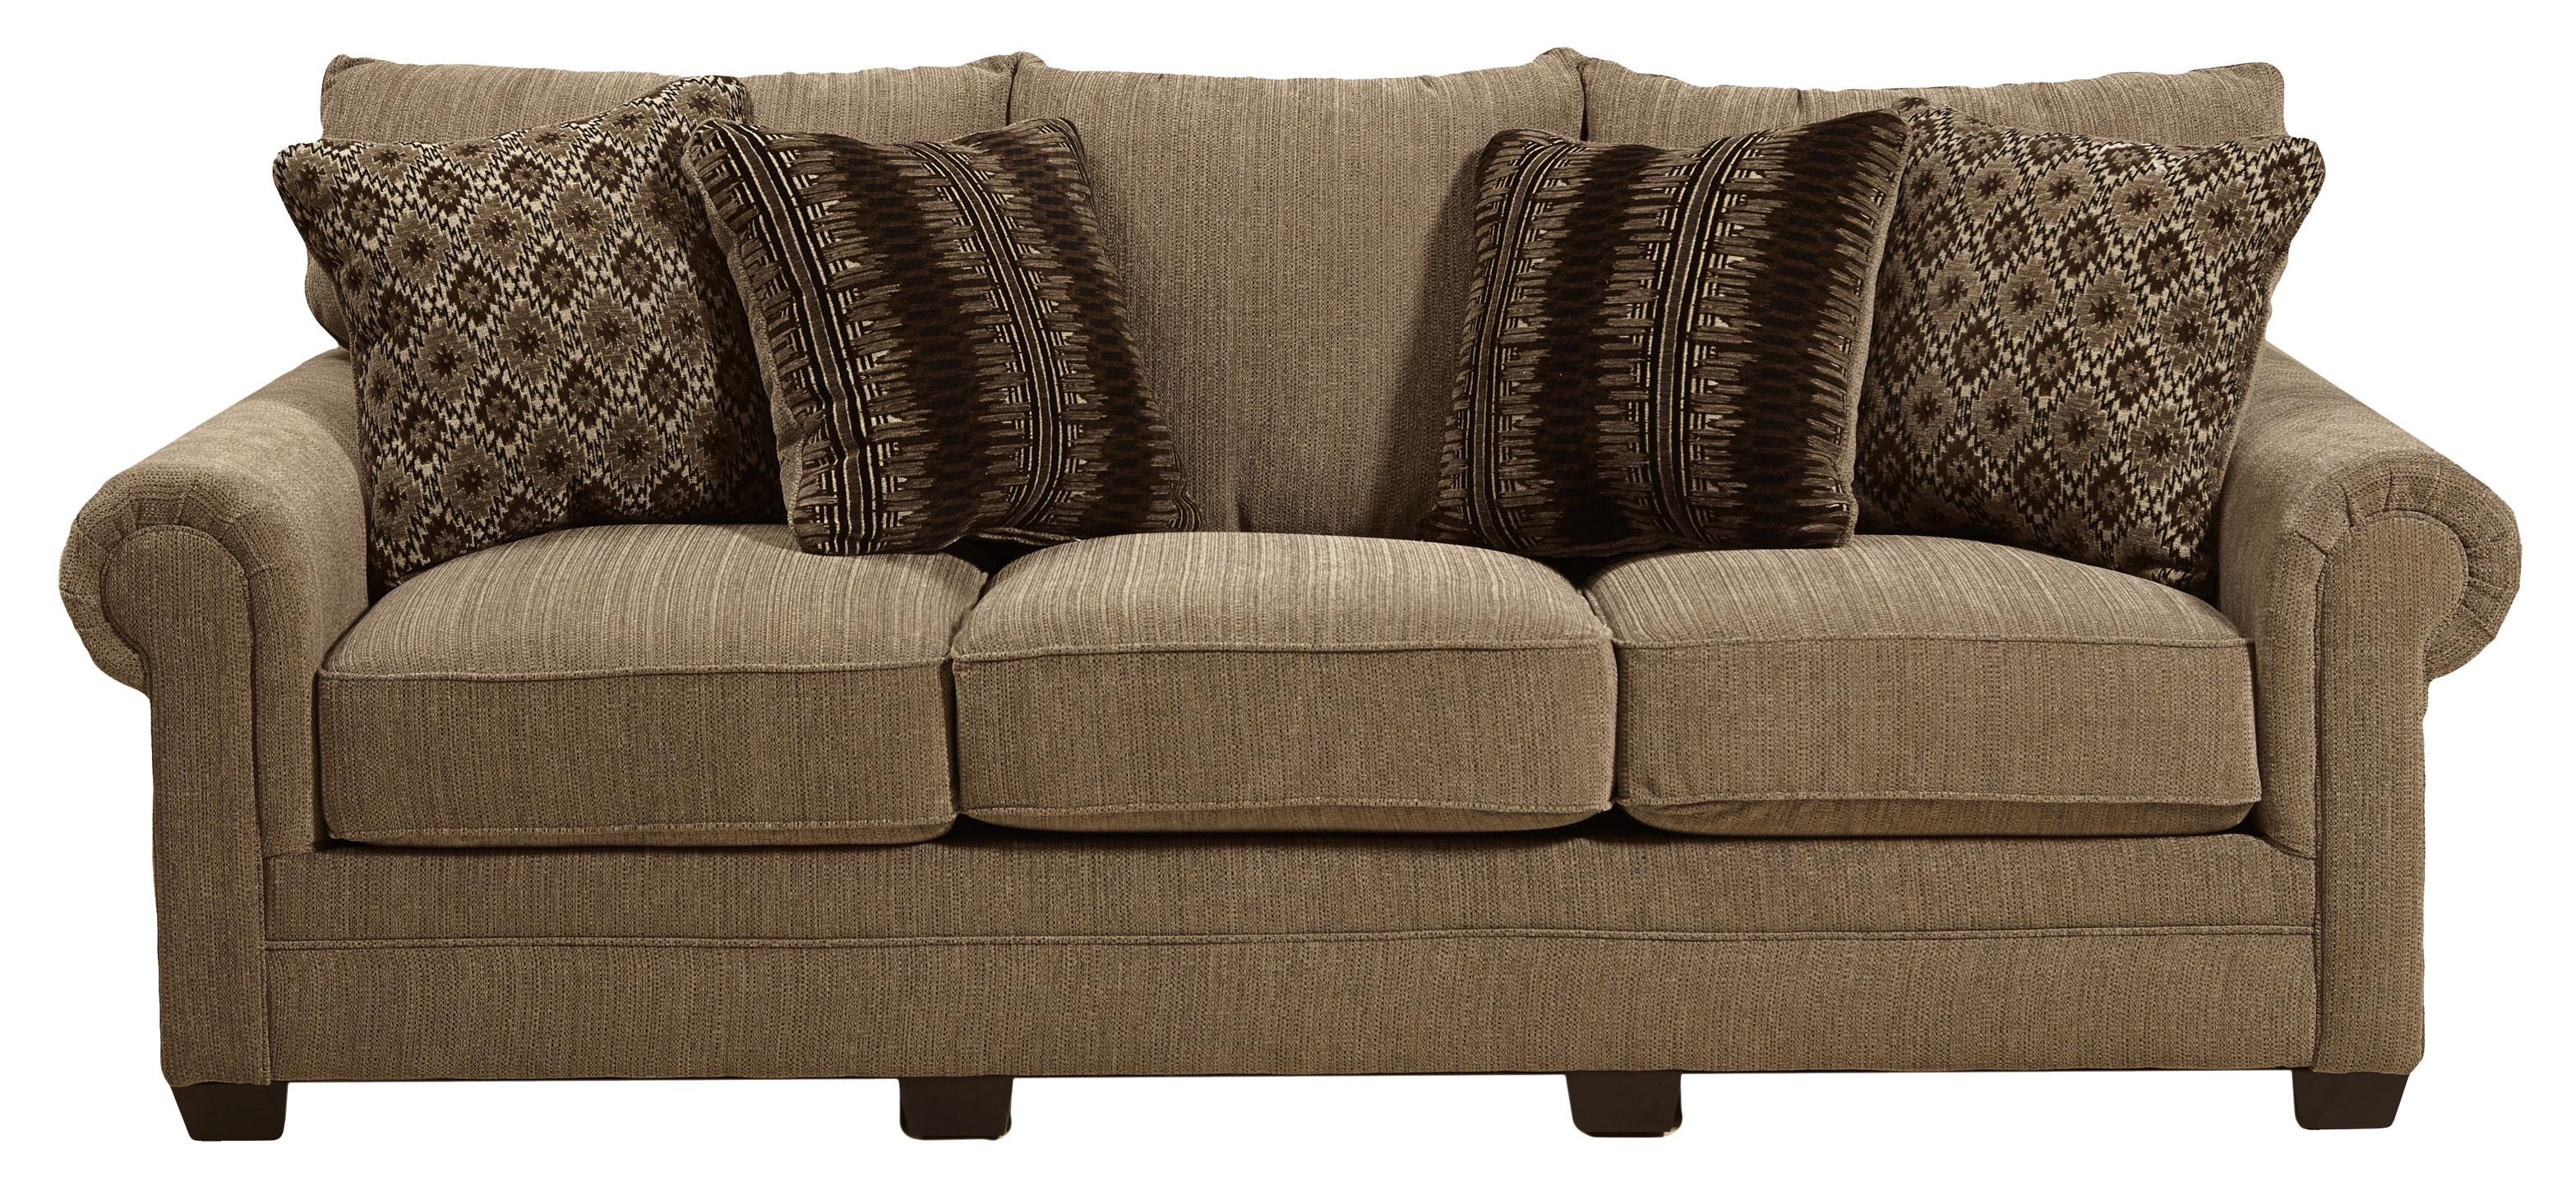 Anniston Stationary Sofa by Jackson Furniture at Lapeer Furniture & Mattress Center